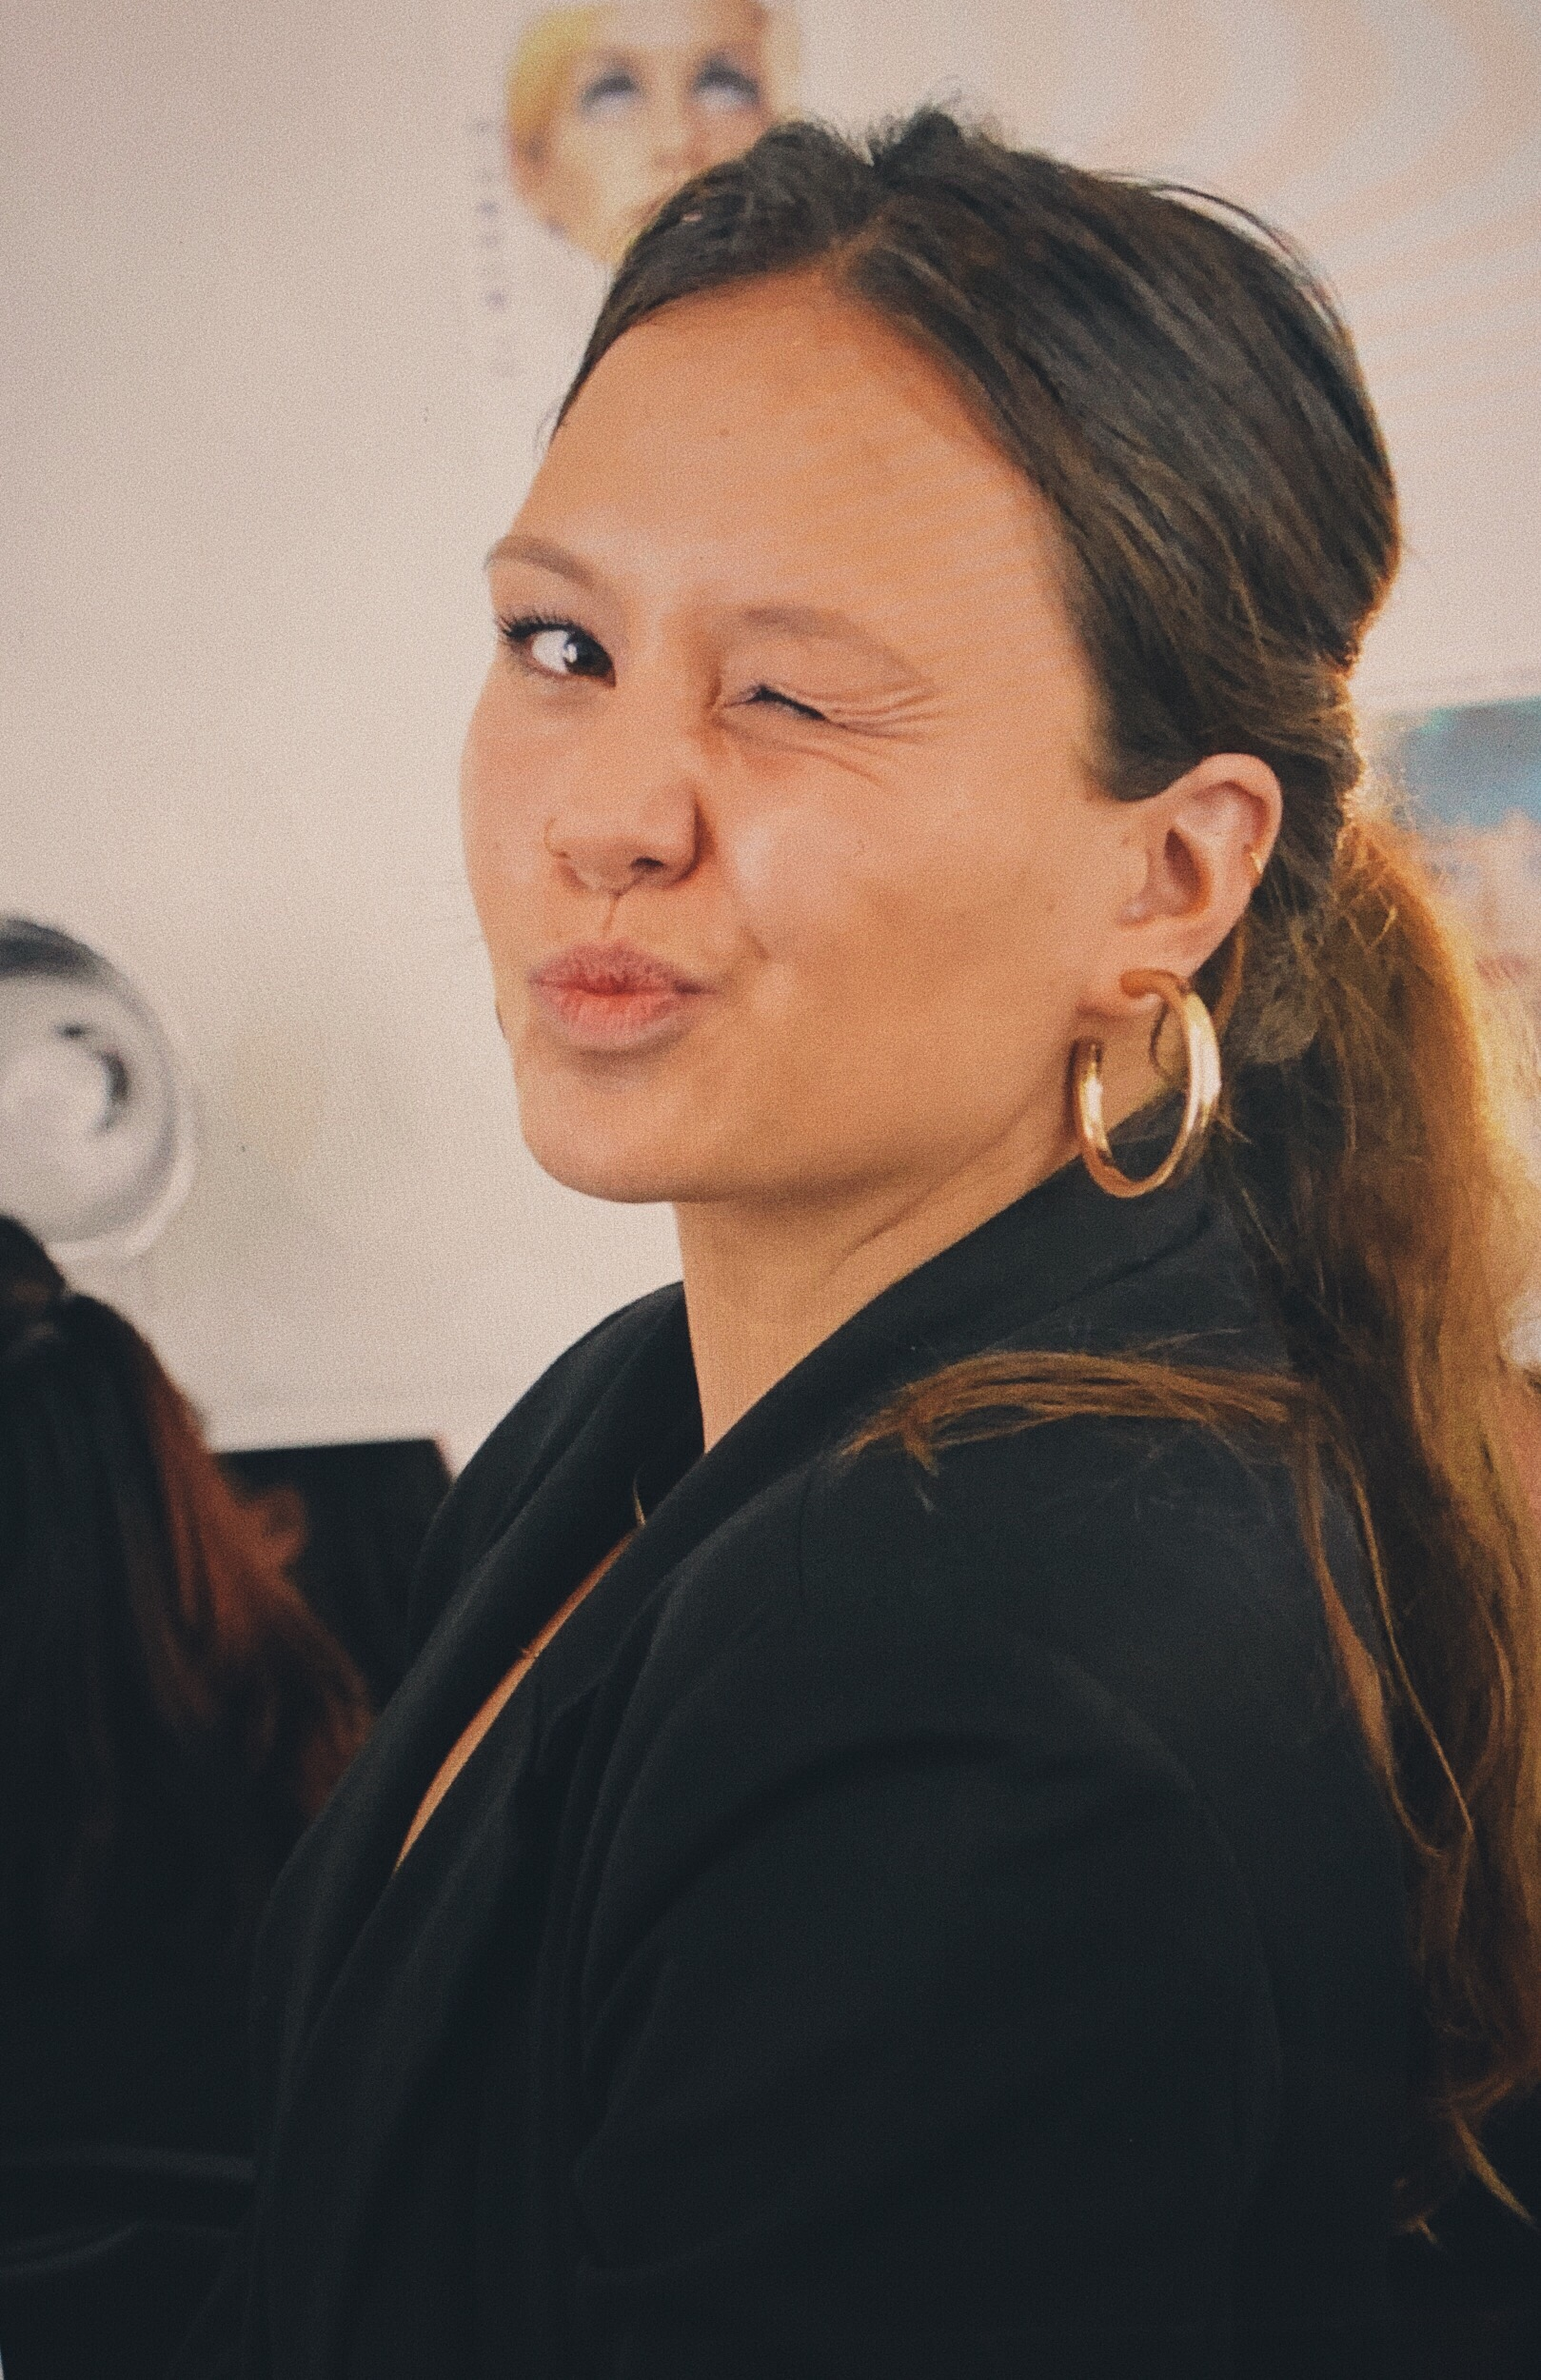 FestPop Staff Writer, Sophia Roca